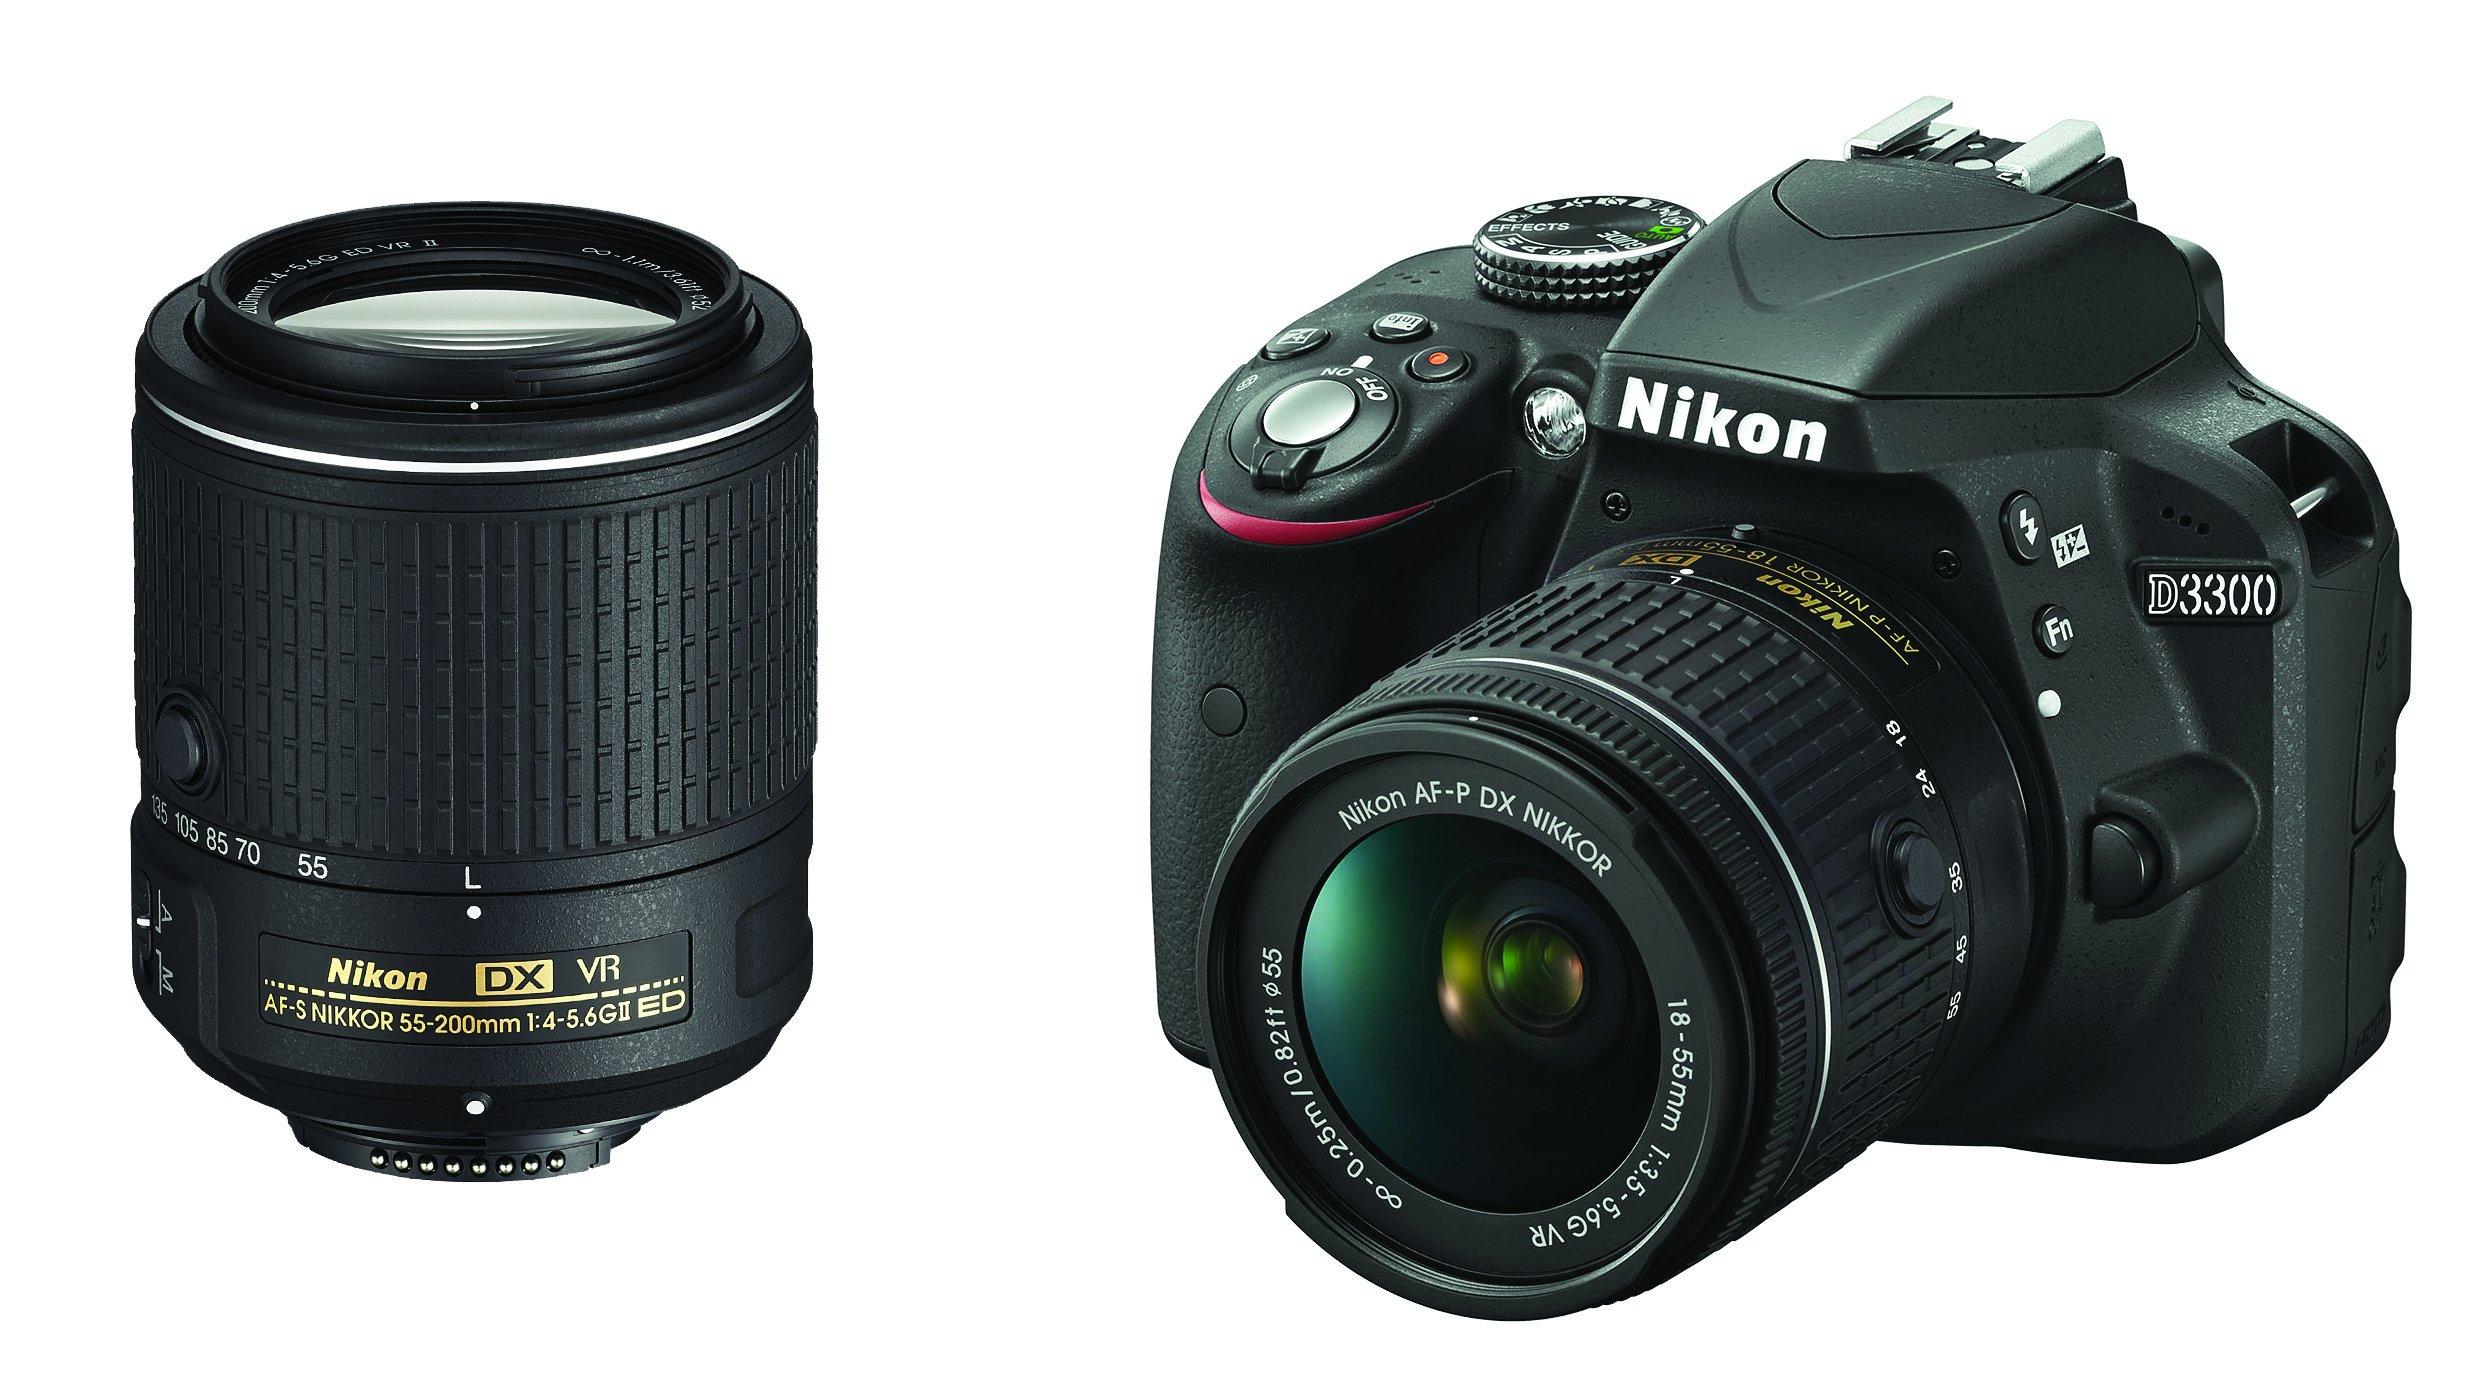 "Nikon D3300 Fotocamera Reflex Digitale con Kit 18-55 VR AF-P e 55-200 VR II, 24,2 Megapixel, LCD 3"", SD da 8 GB 300x Premium Lexar, Nero [Nital Card: 4 Anni di Garanzia] product image"